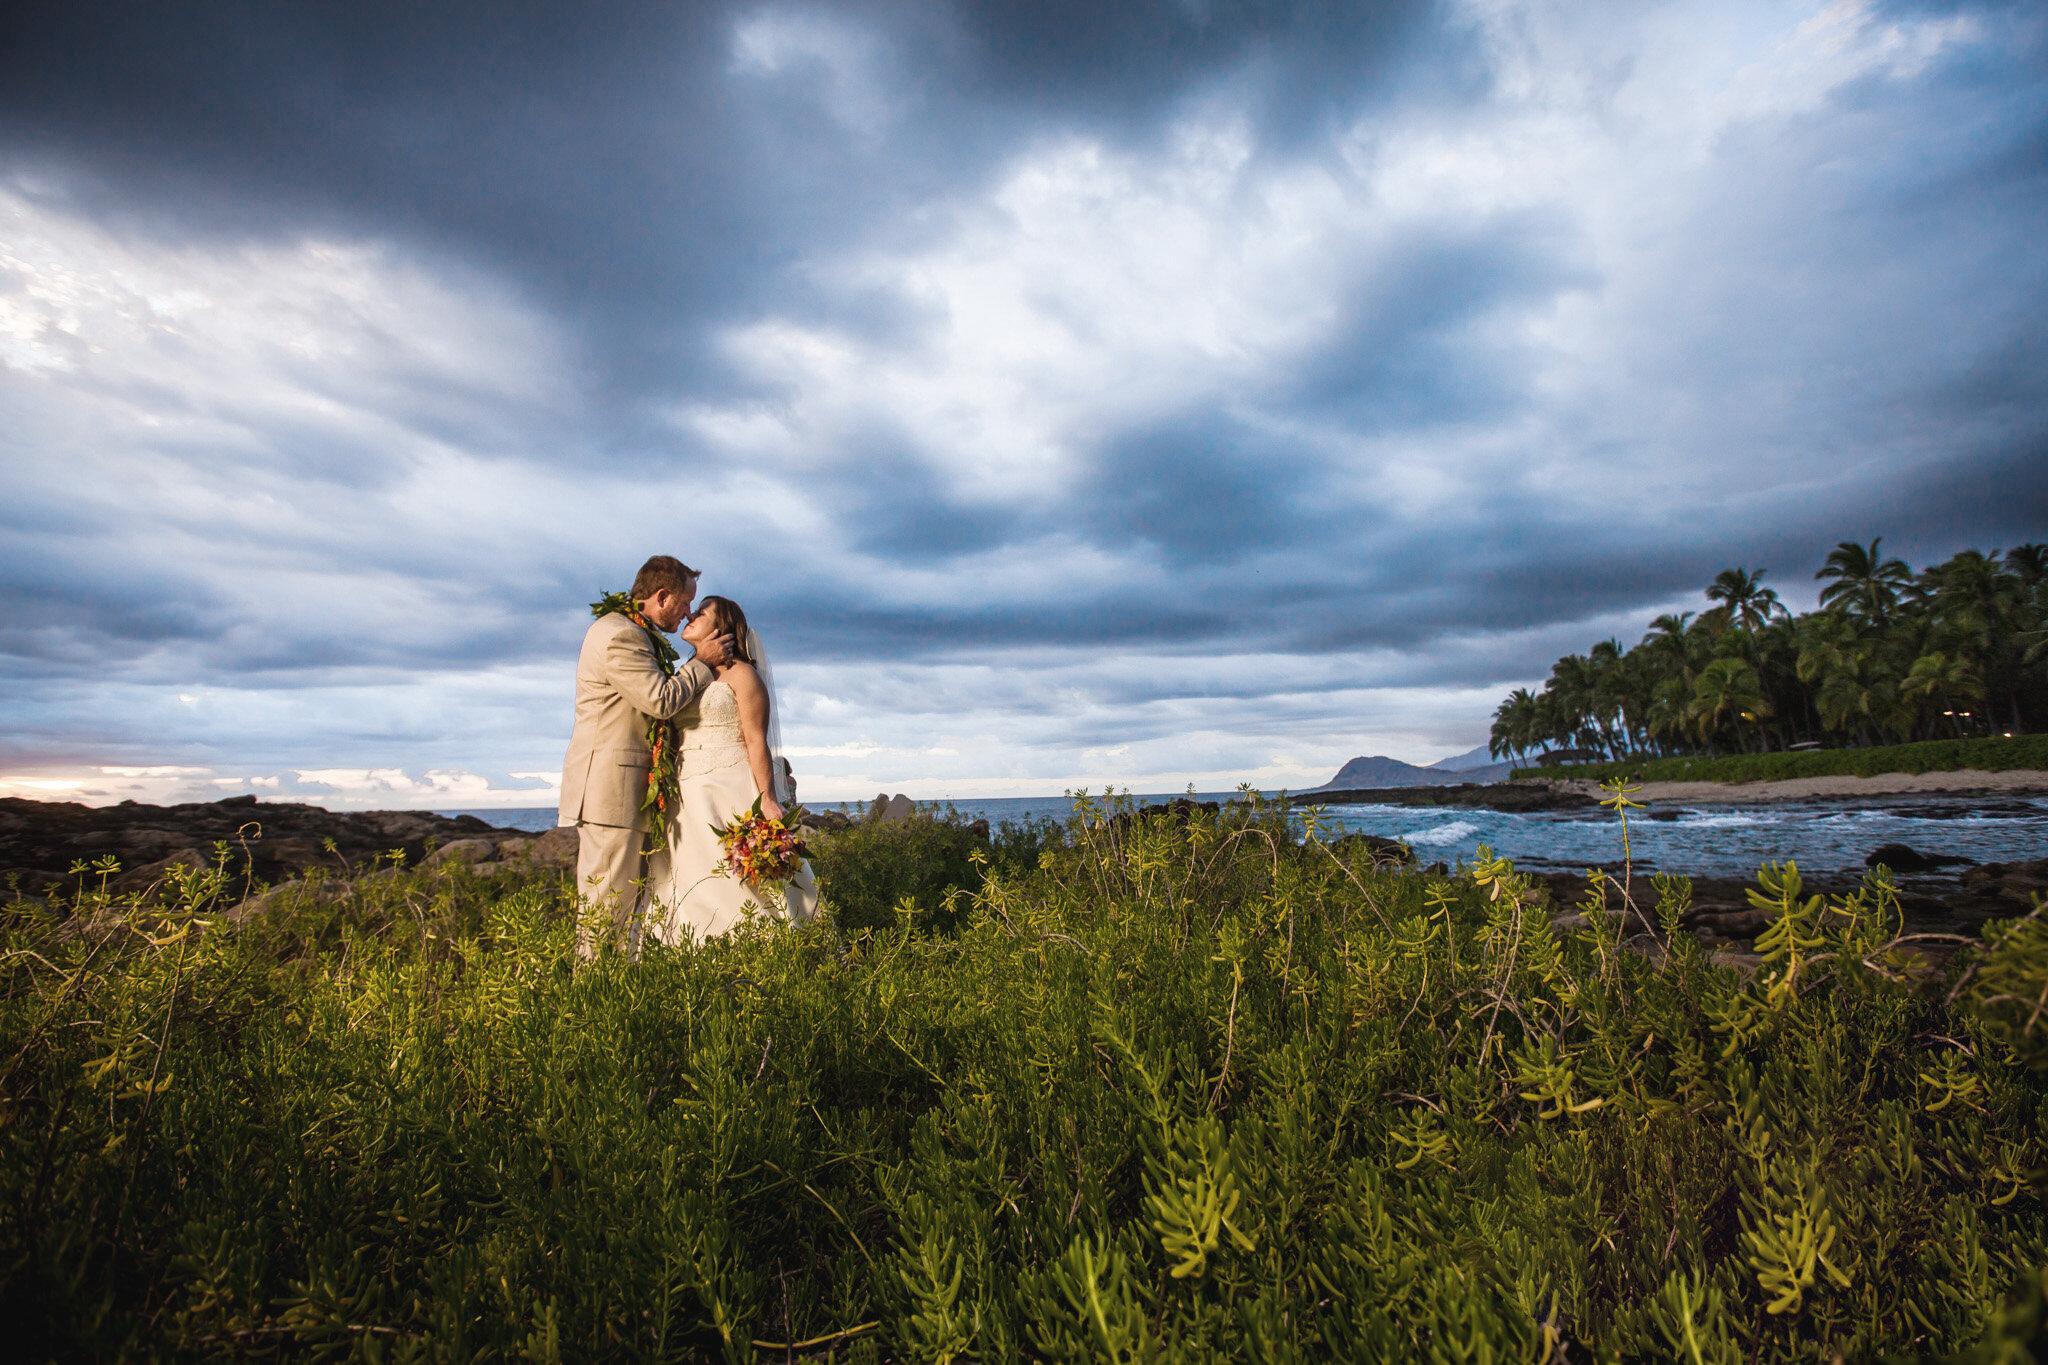 New York New Jersey Long Island Destination Weddings New York City Nyc Nj Wedding Photographer Angelica Criscuolo Photography